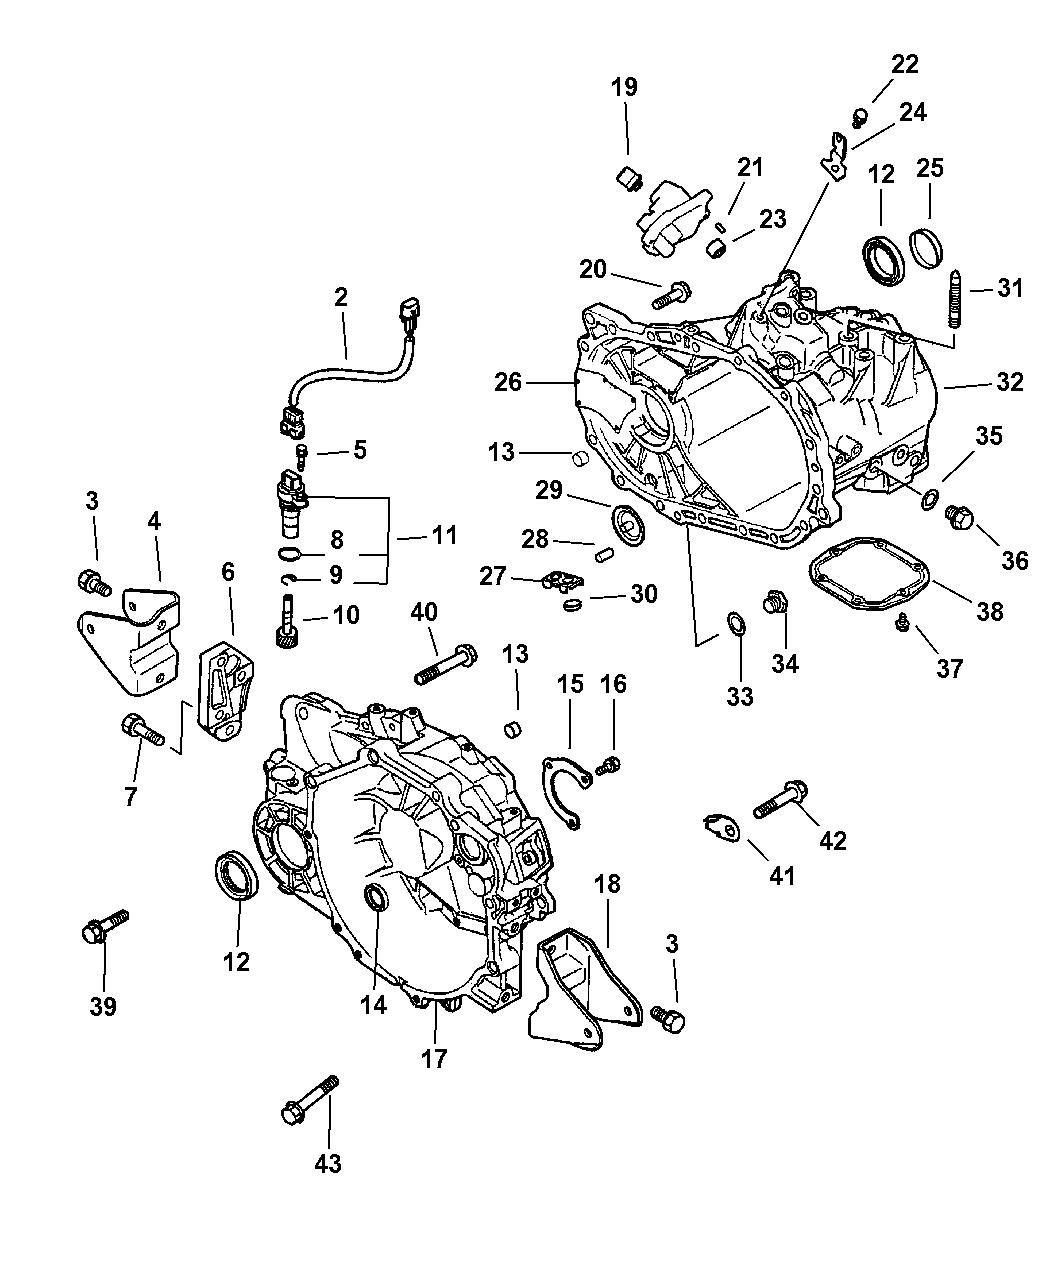 md622013